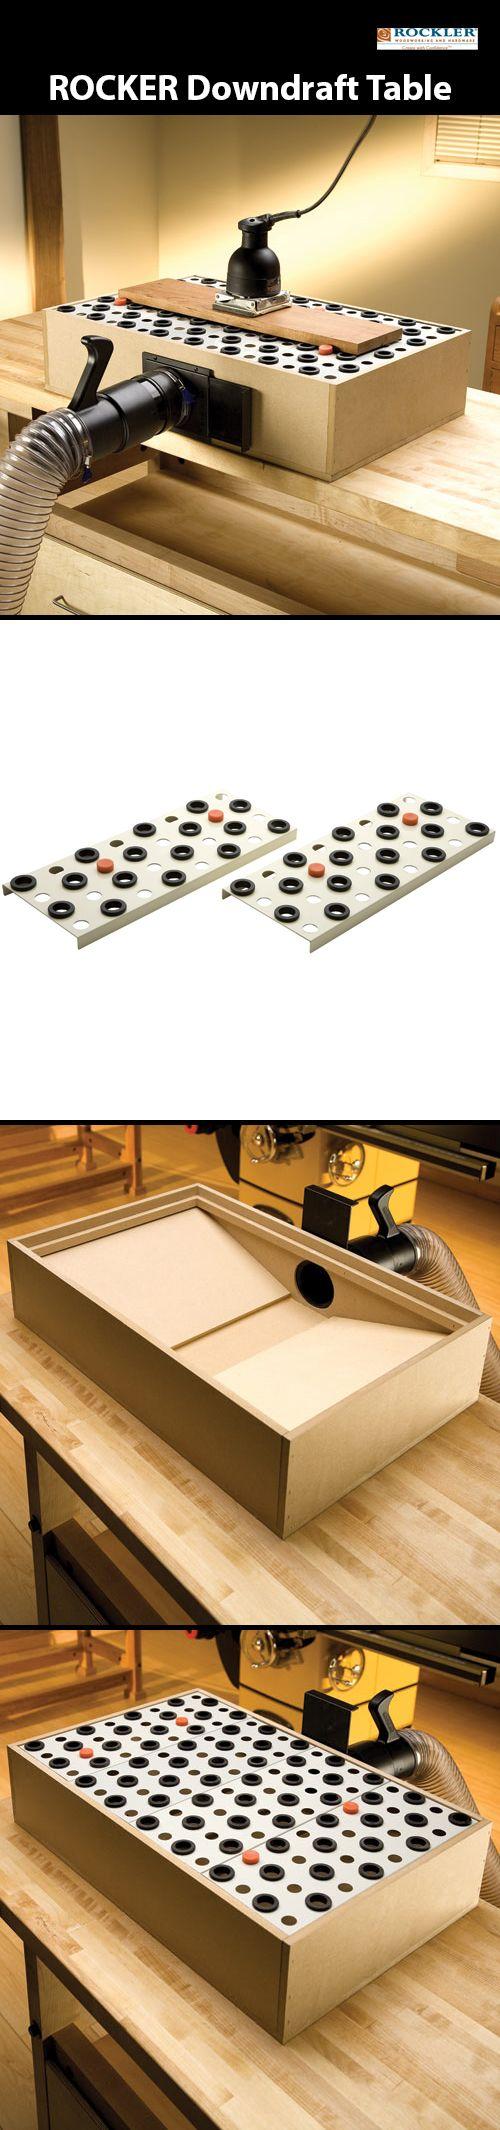 Comdowndraft Table Design : Downdraft Table Panels  Tools & tip  Pinterest